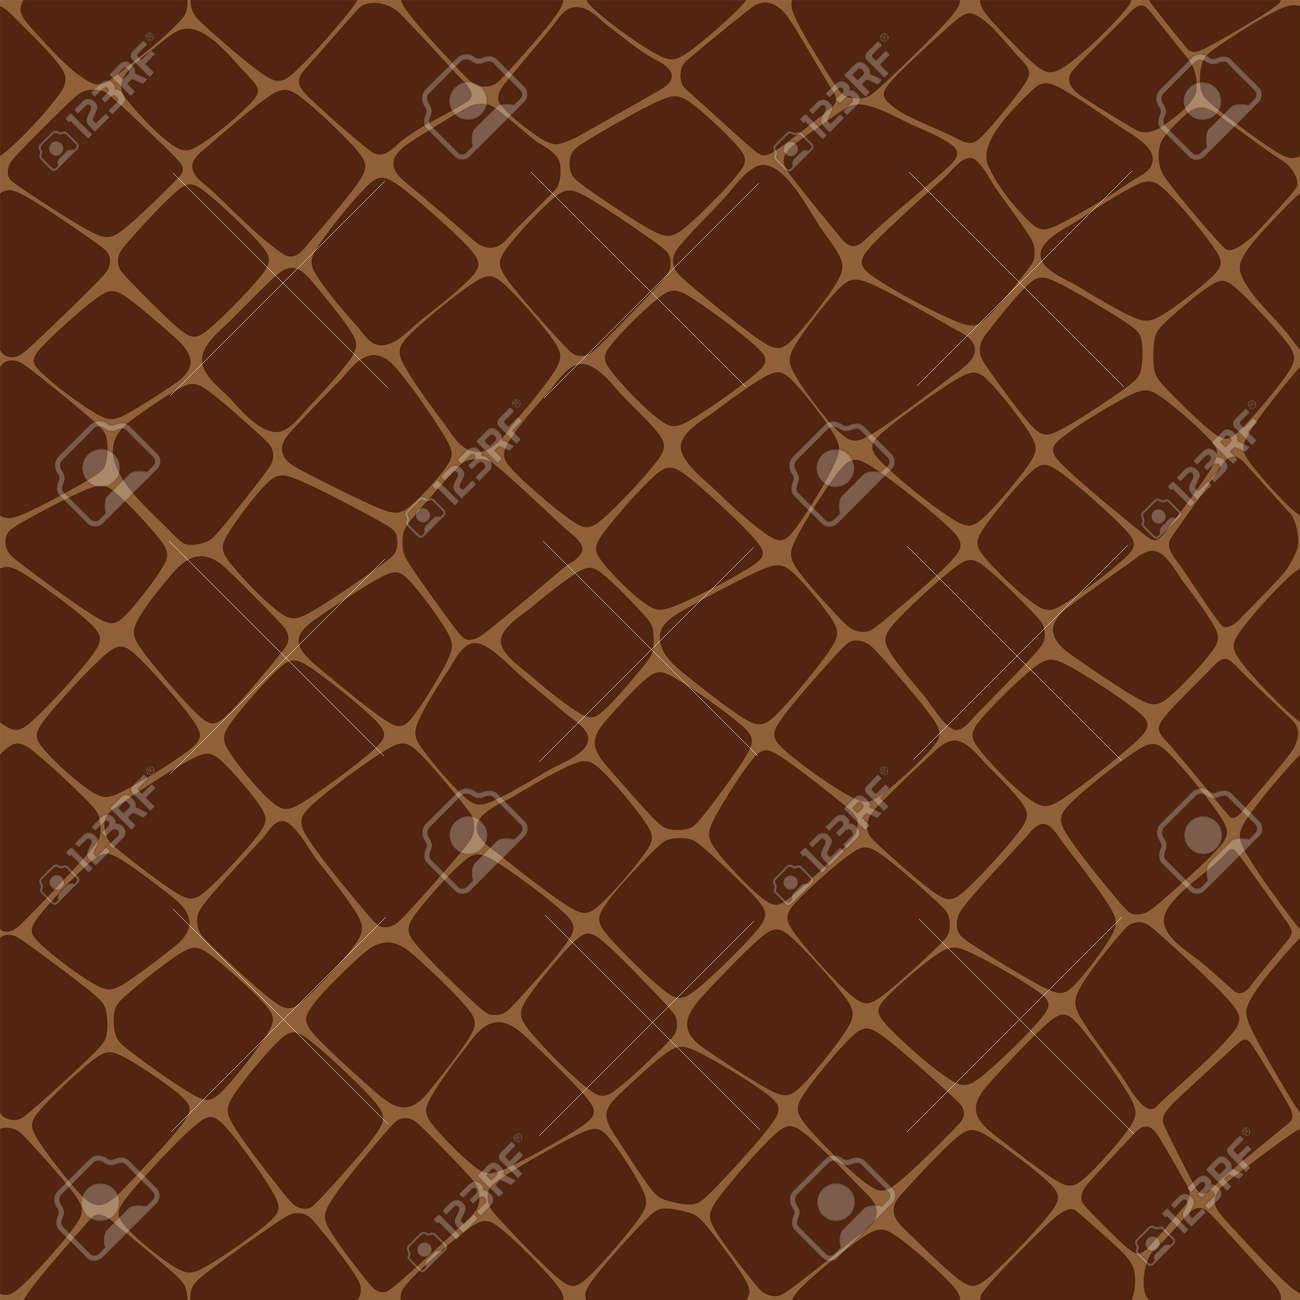 Seamless Vector illustration of Reptilian Skin Standard-Bild - 12308576